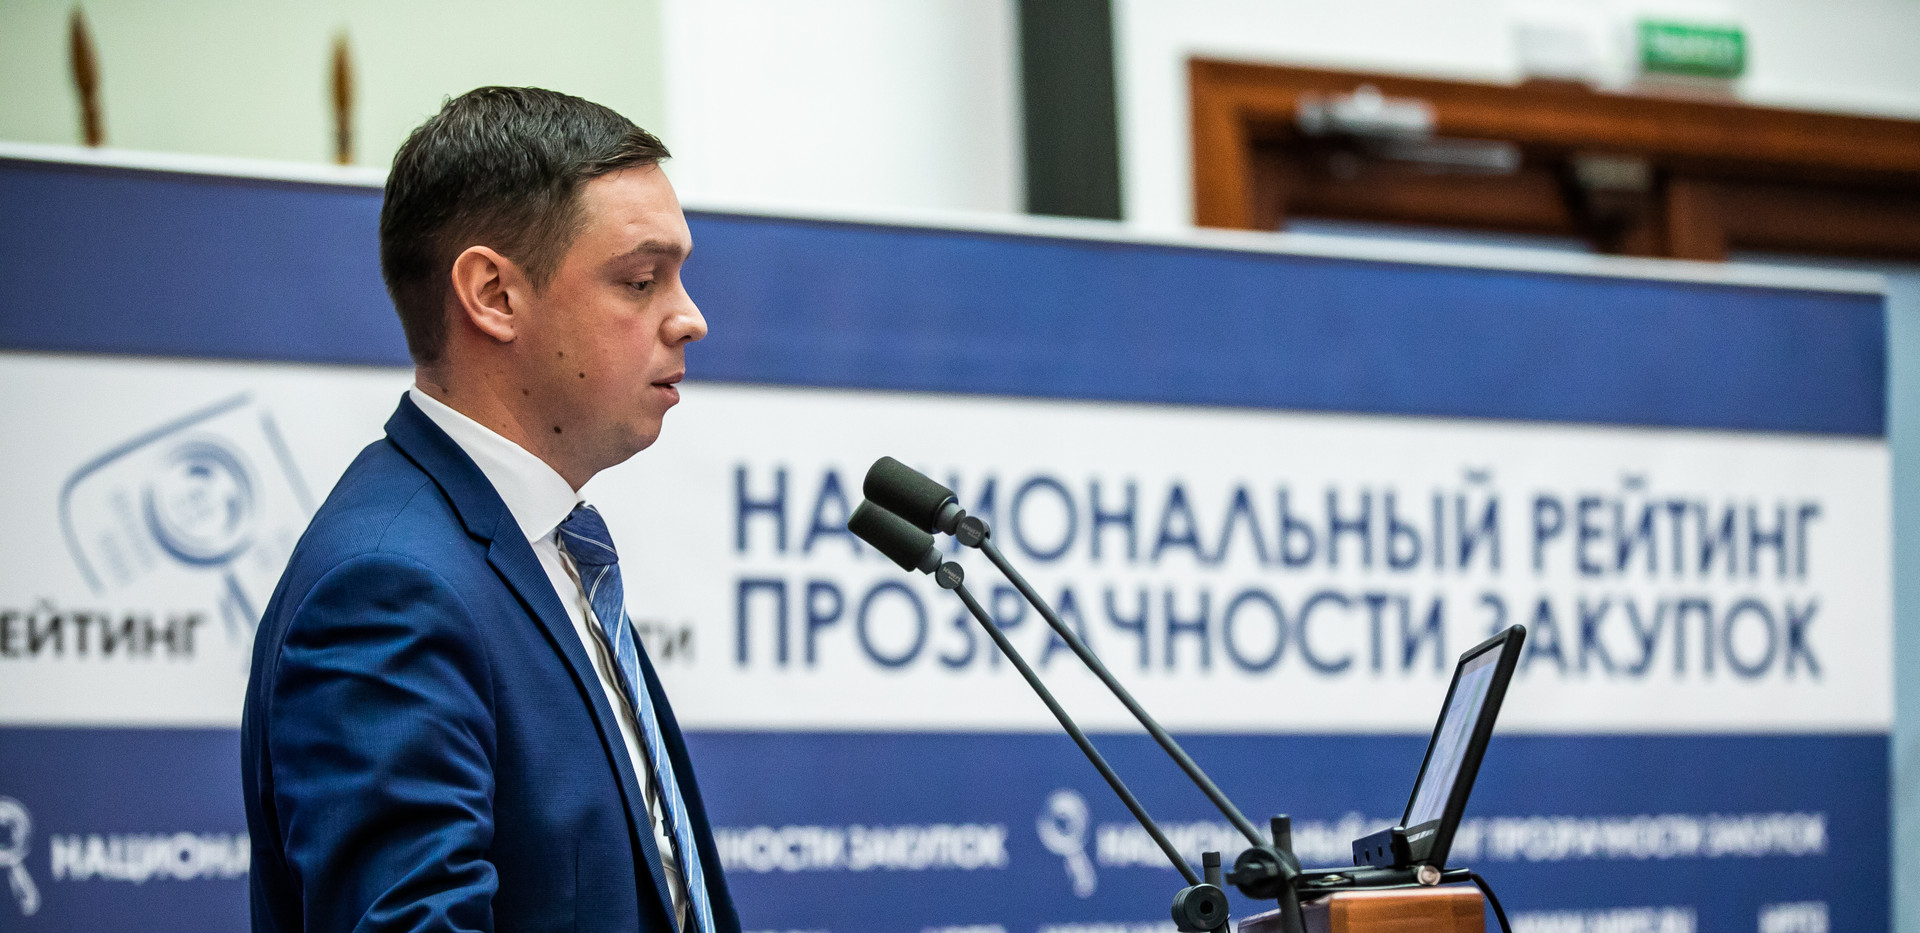 Доклады - 1 - НРПЗ - Симоненко В..jpg